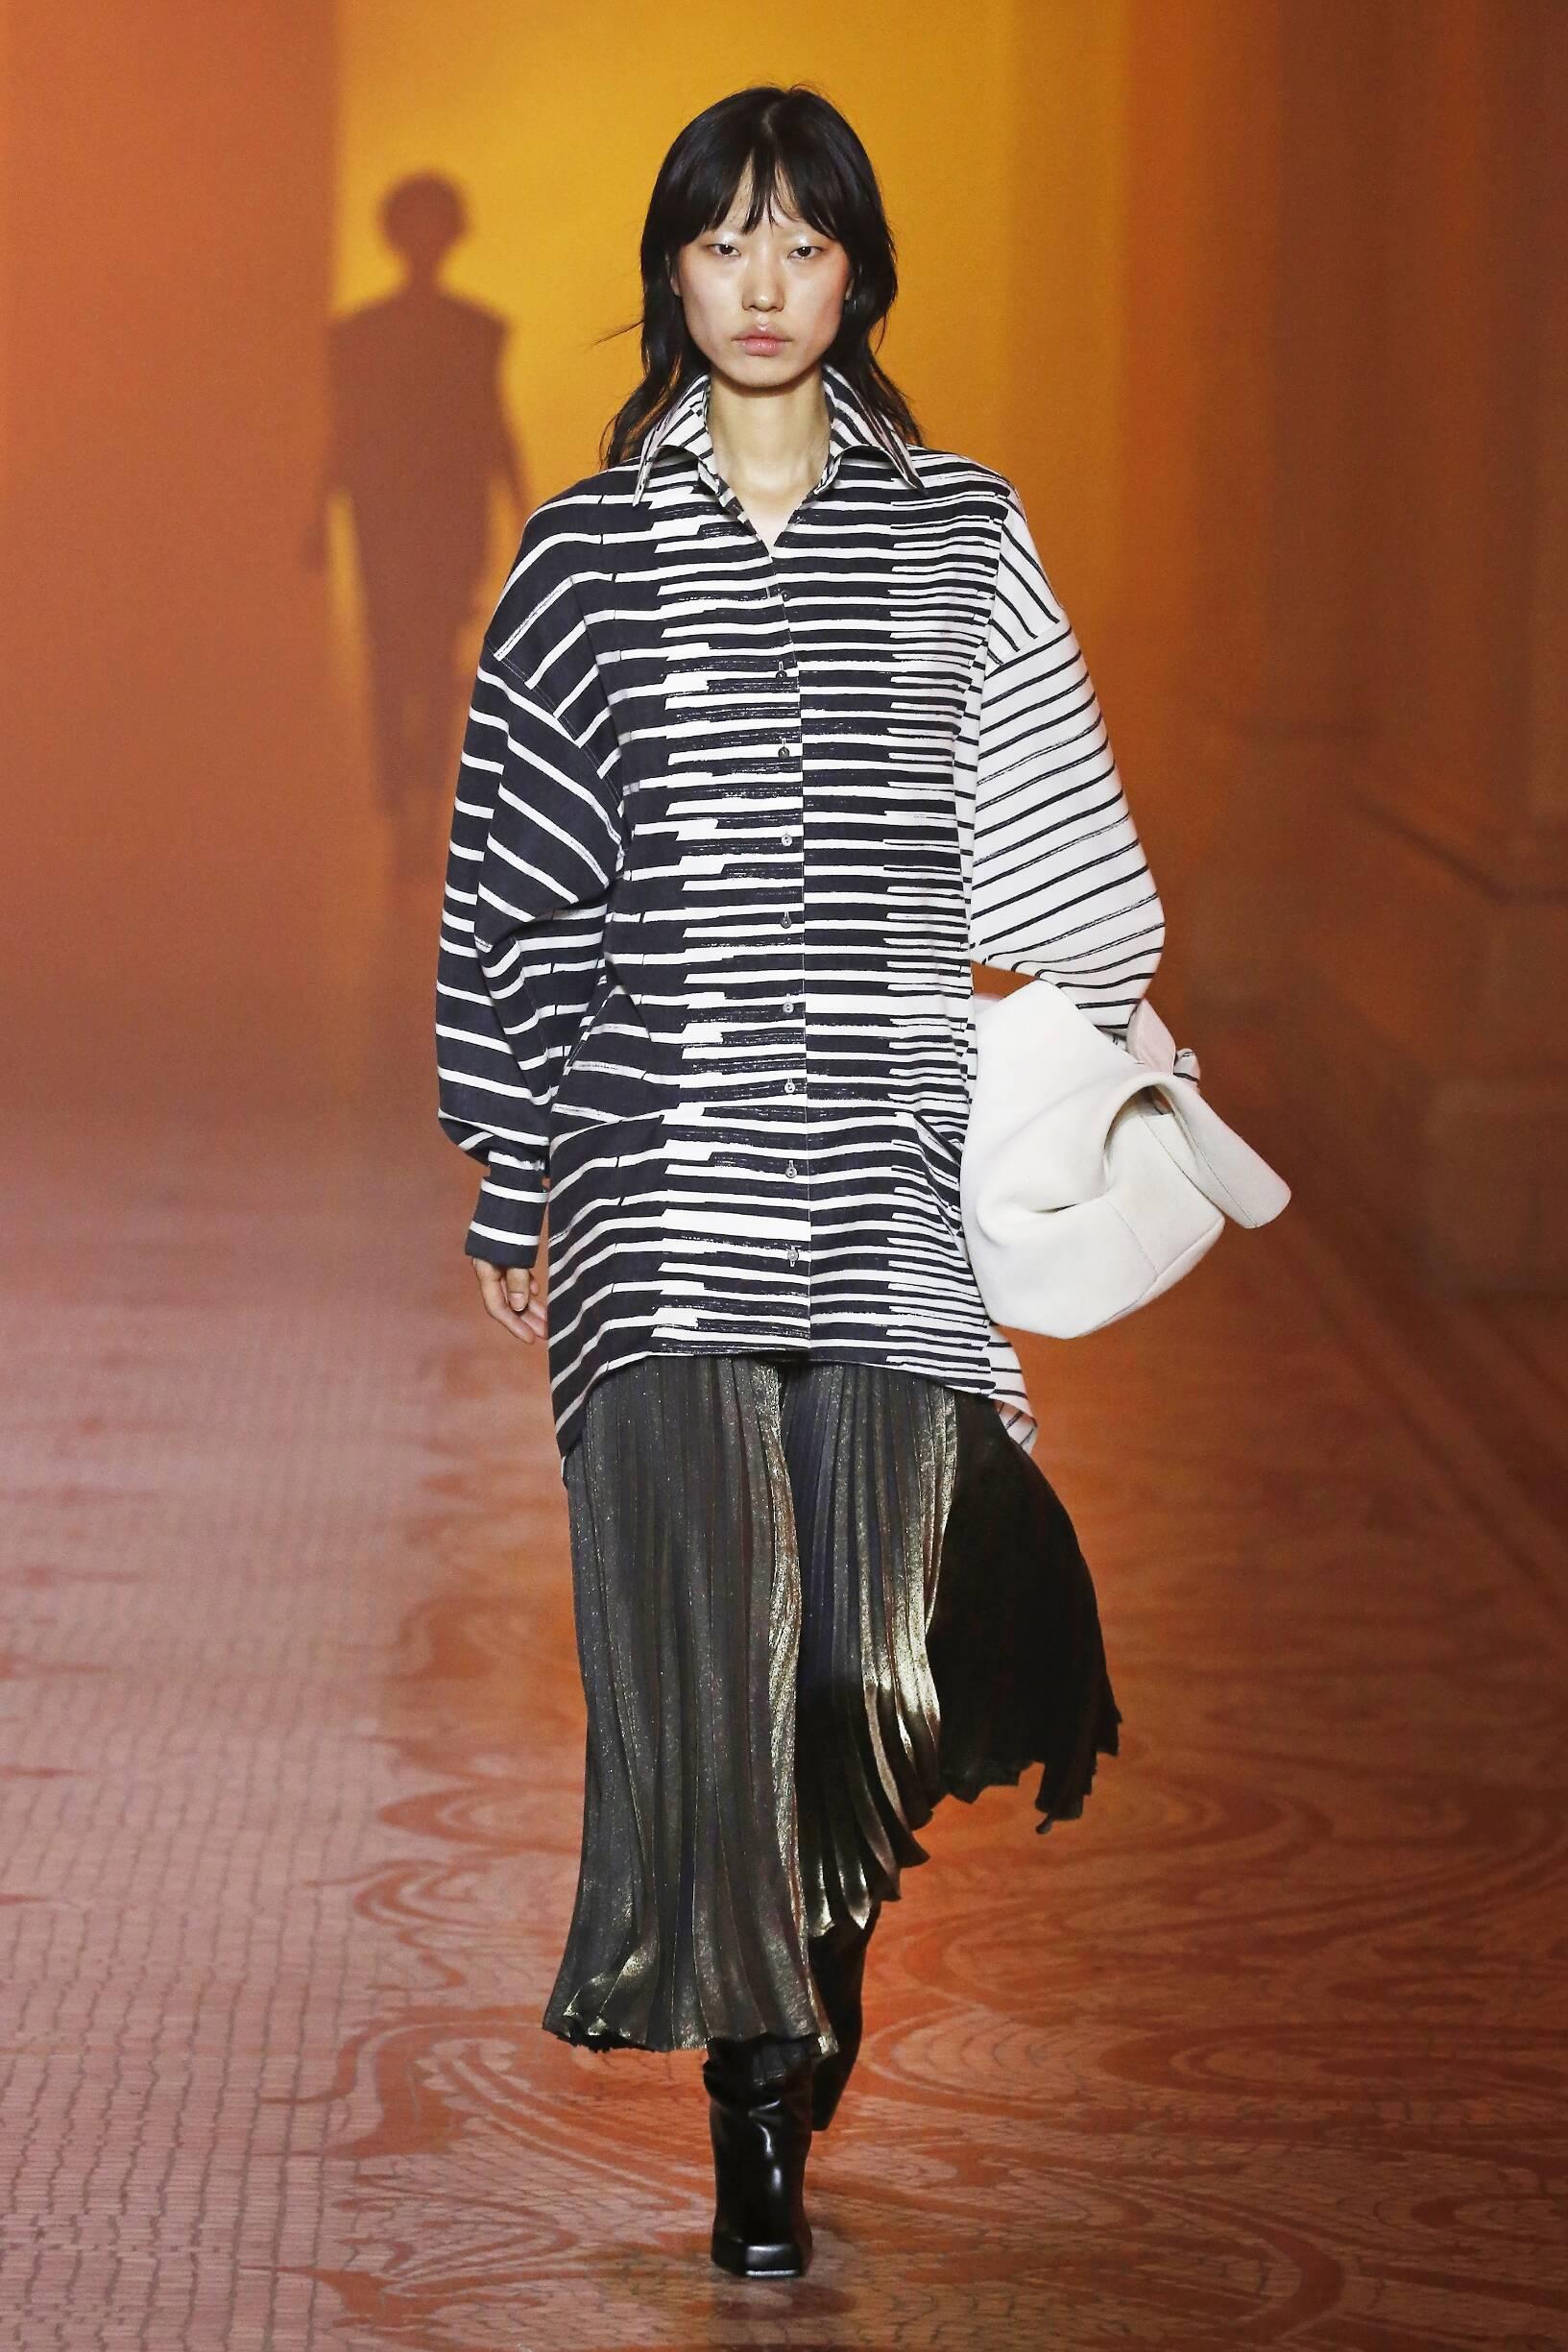 Fashion Model Poiret Catwalk